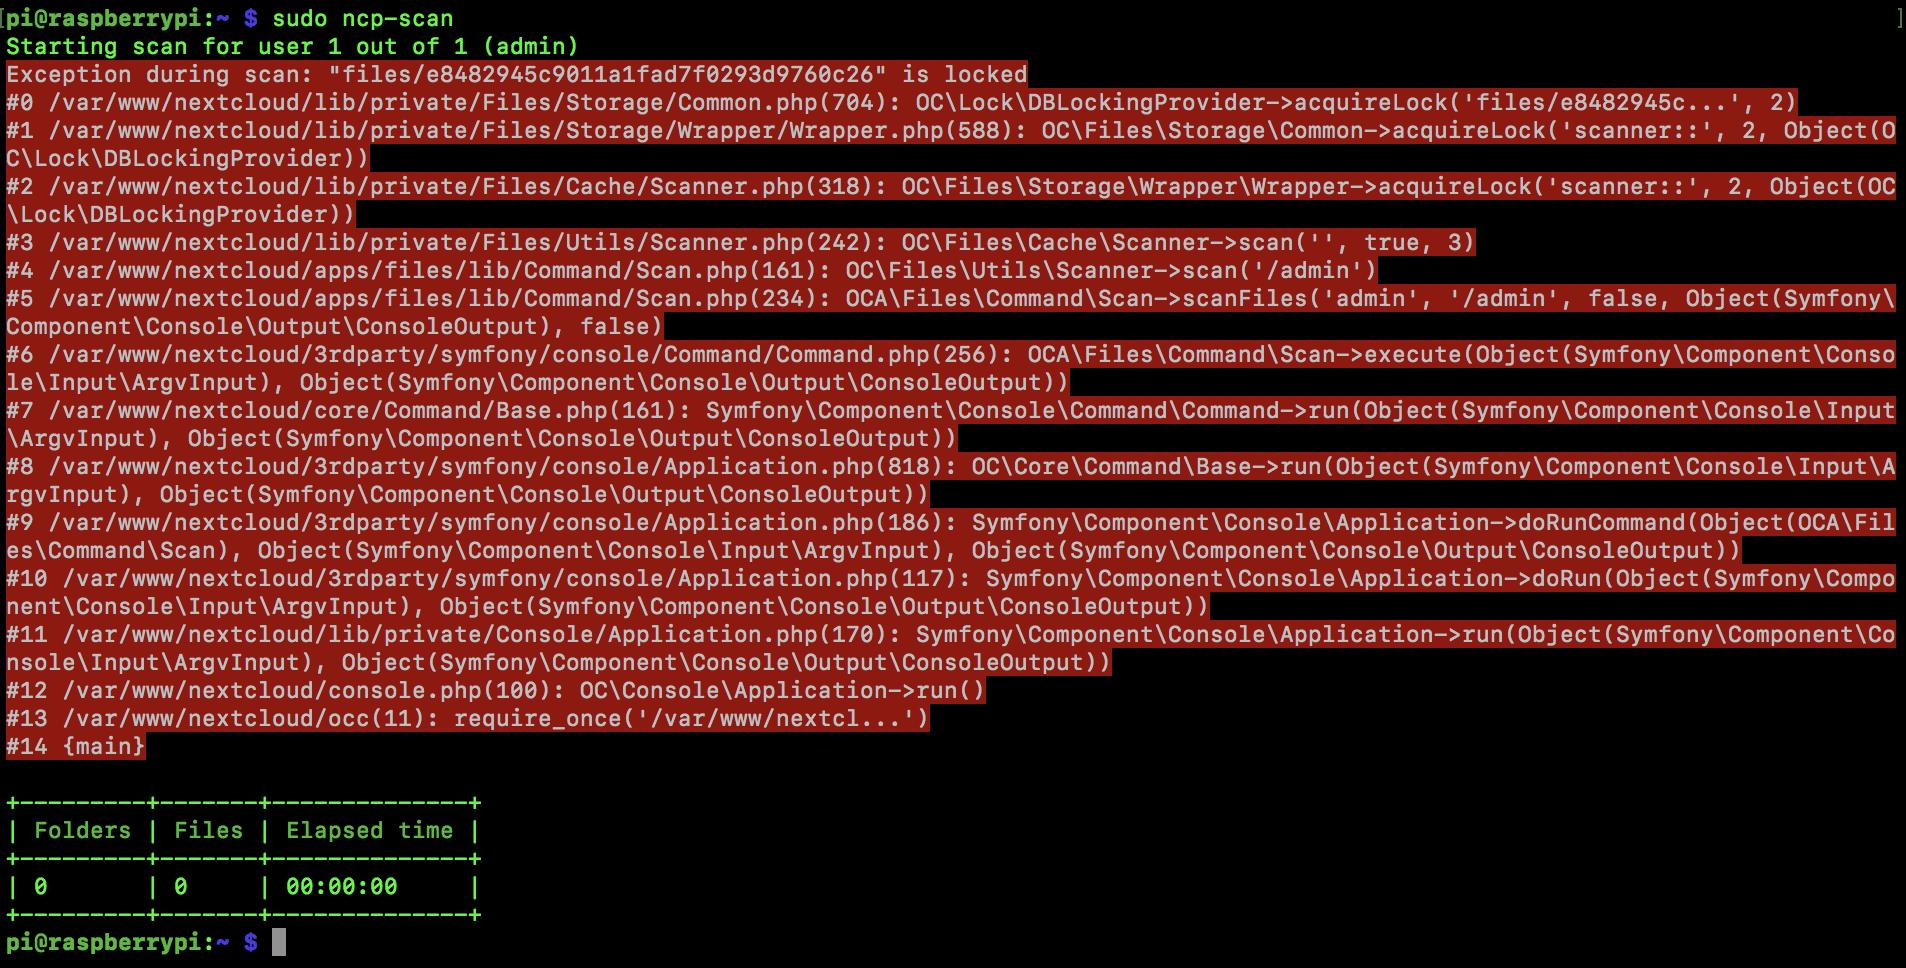 lol scanning files problem